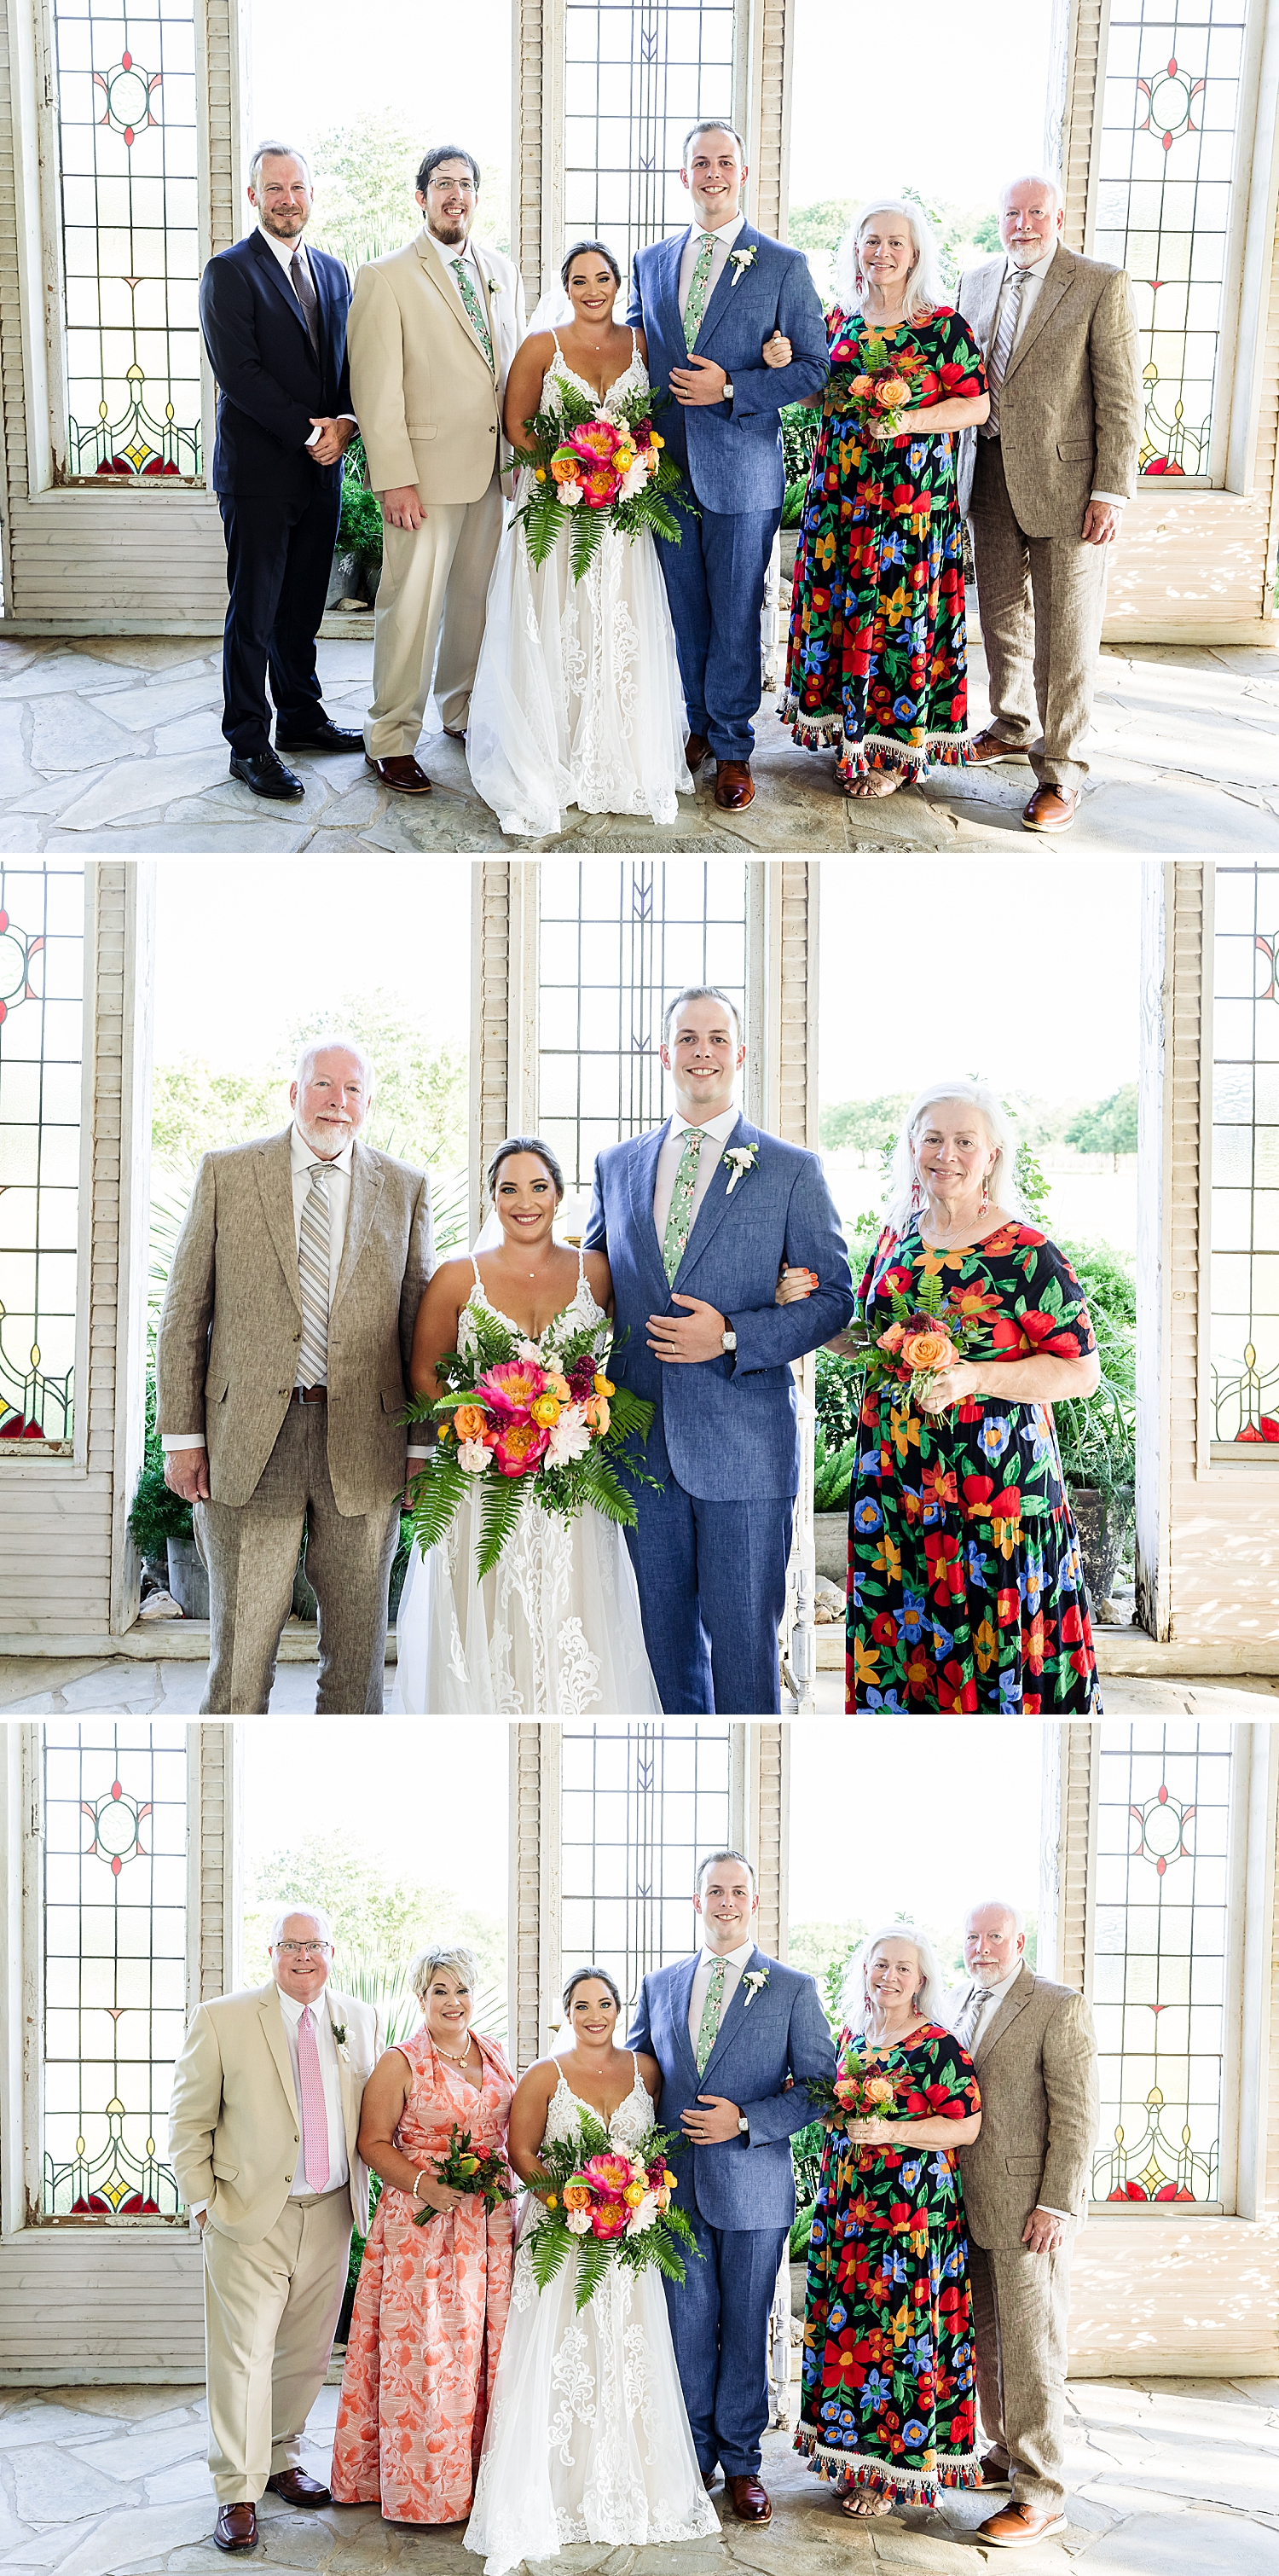 Gruene-Estate-Wedding-New-Braunfels-Bride-Wedding-Photos-Carly-Barton-Photography_0083.jpg